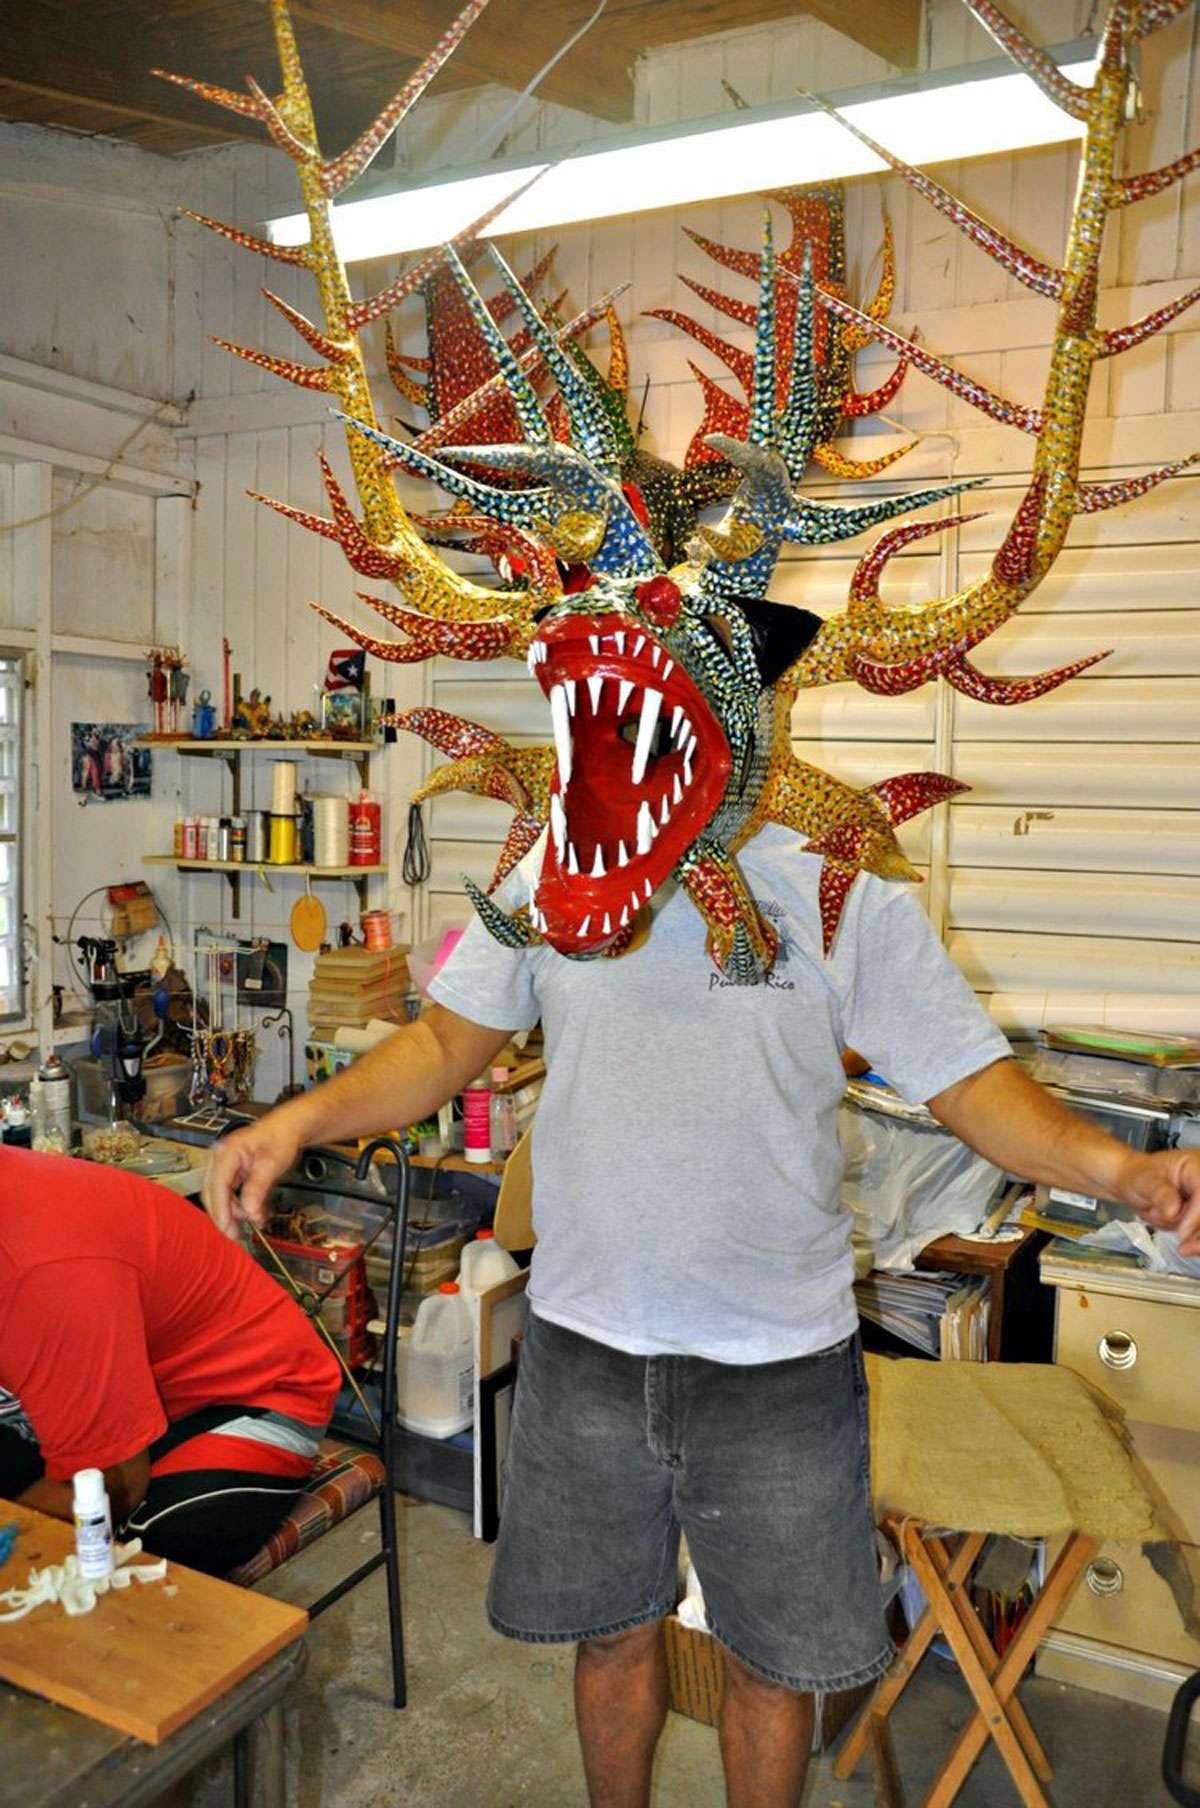 Juan Alindato Junior   shows off one of his creations.   Photo: Meg Pier